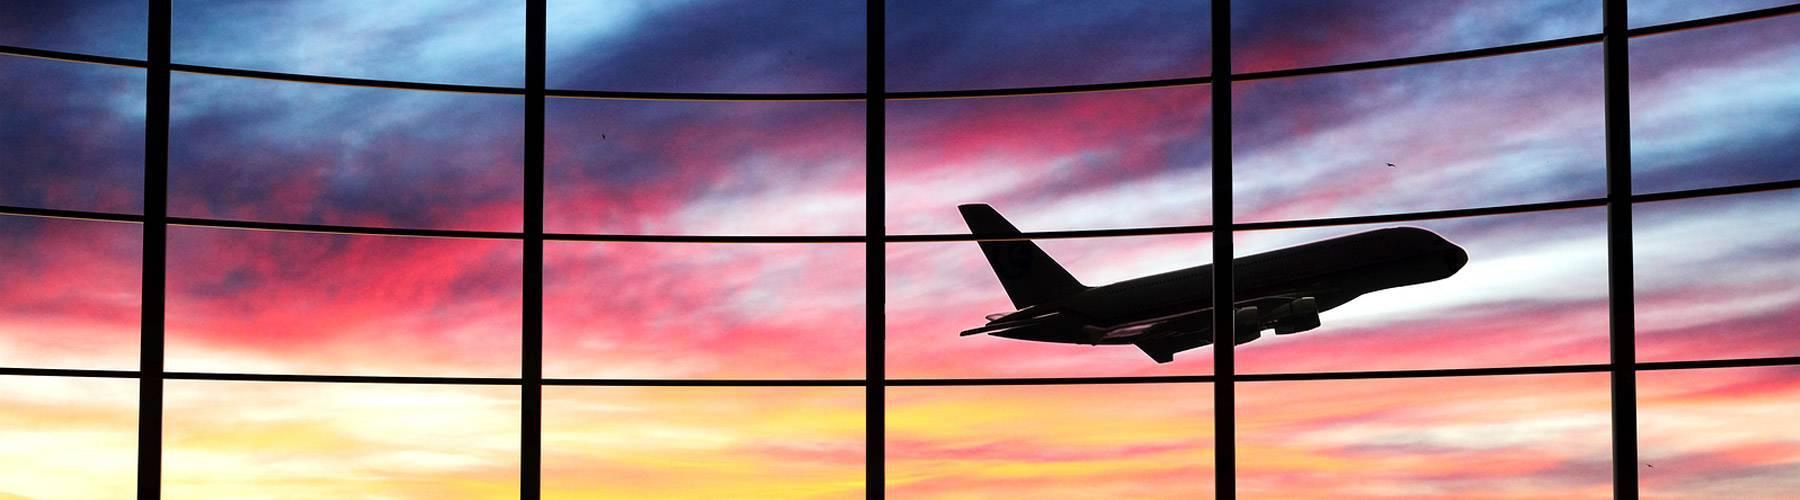 China Flights Service